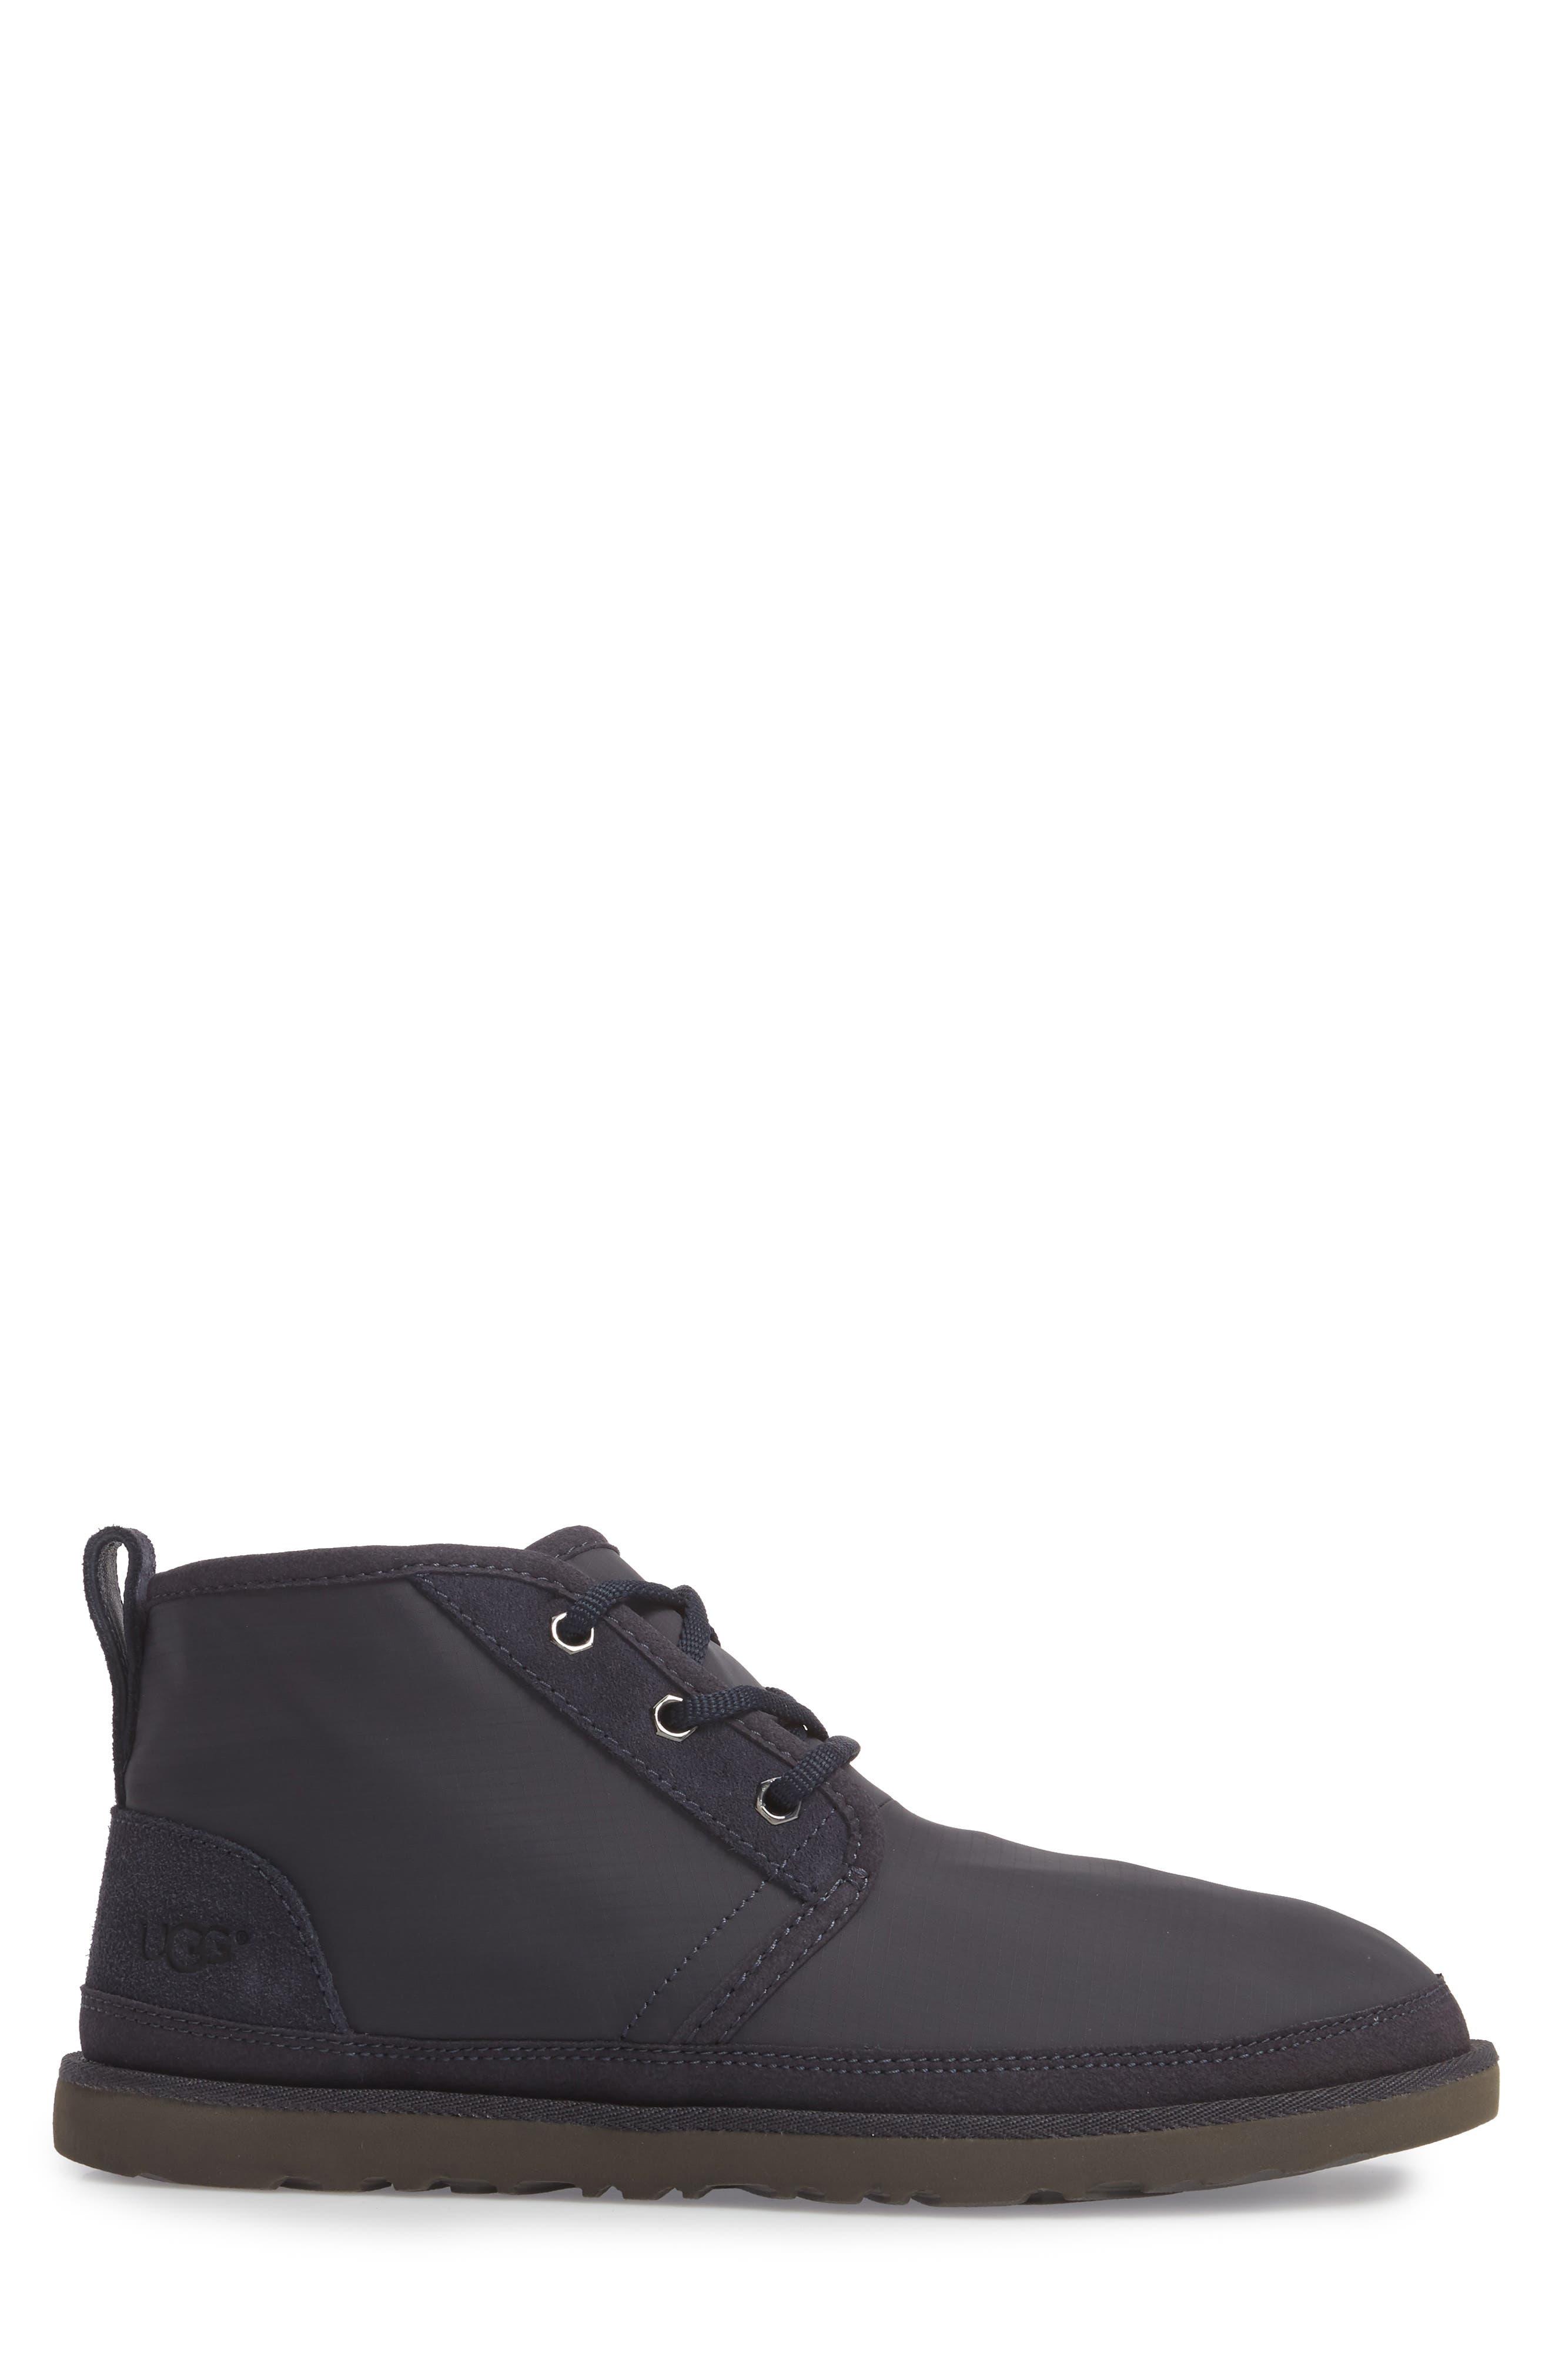 Neumel Ripstop Chukka Boot,                             Alternate thumbnail 3, color,                             True Navy Leather